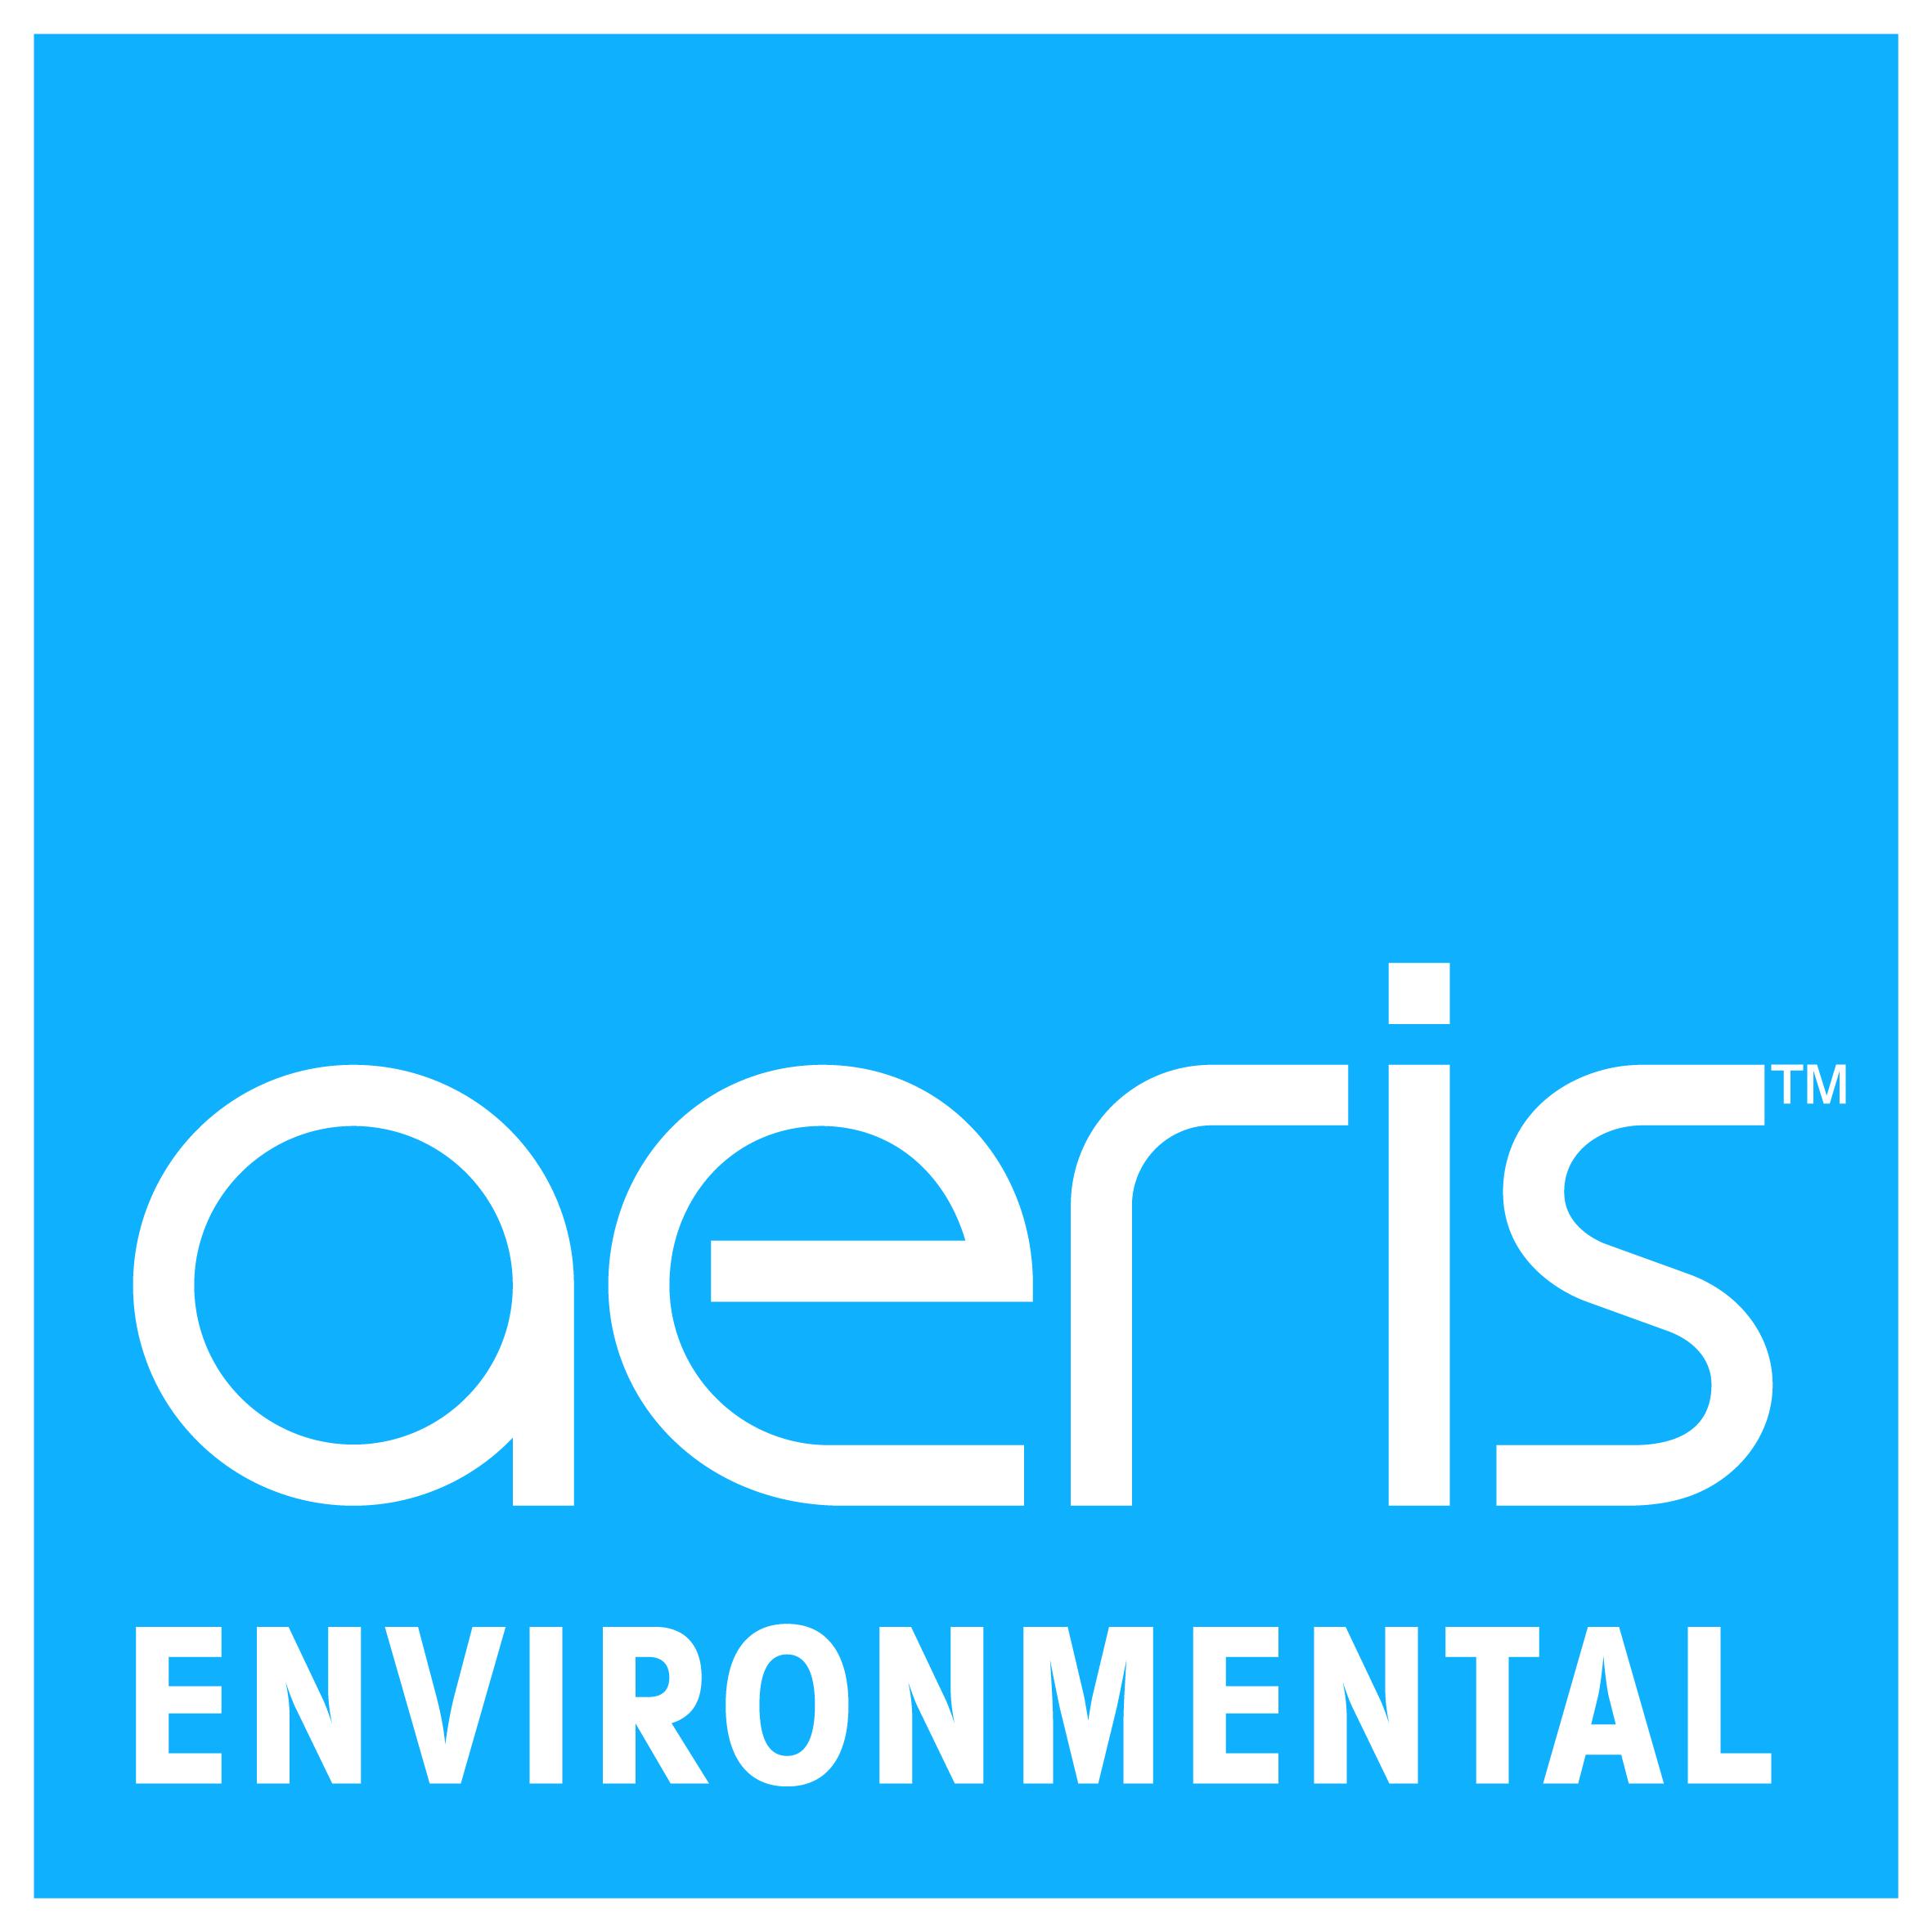 Aeris Environmental